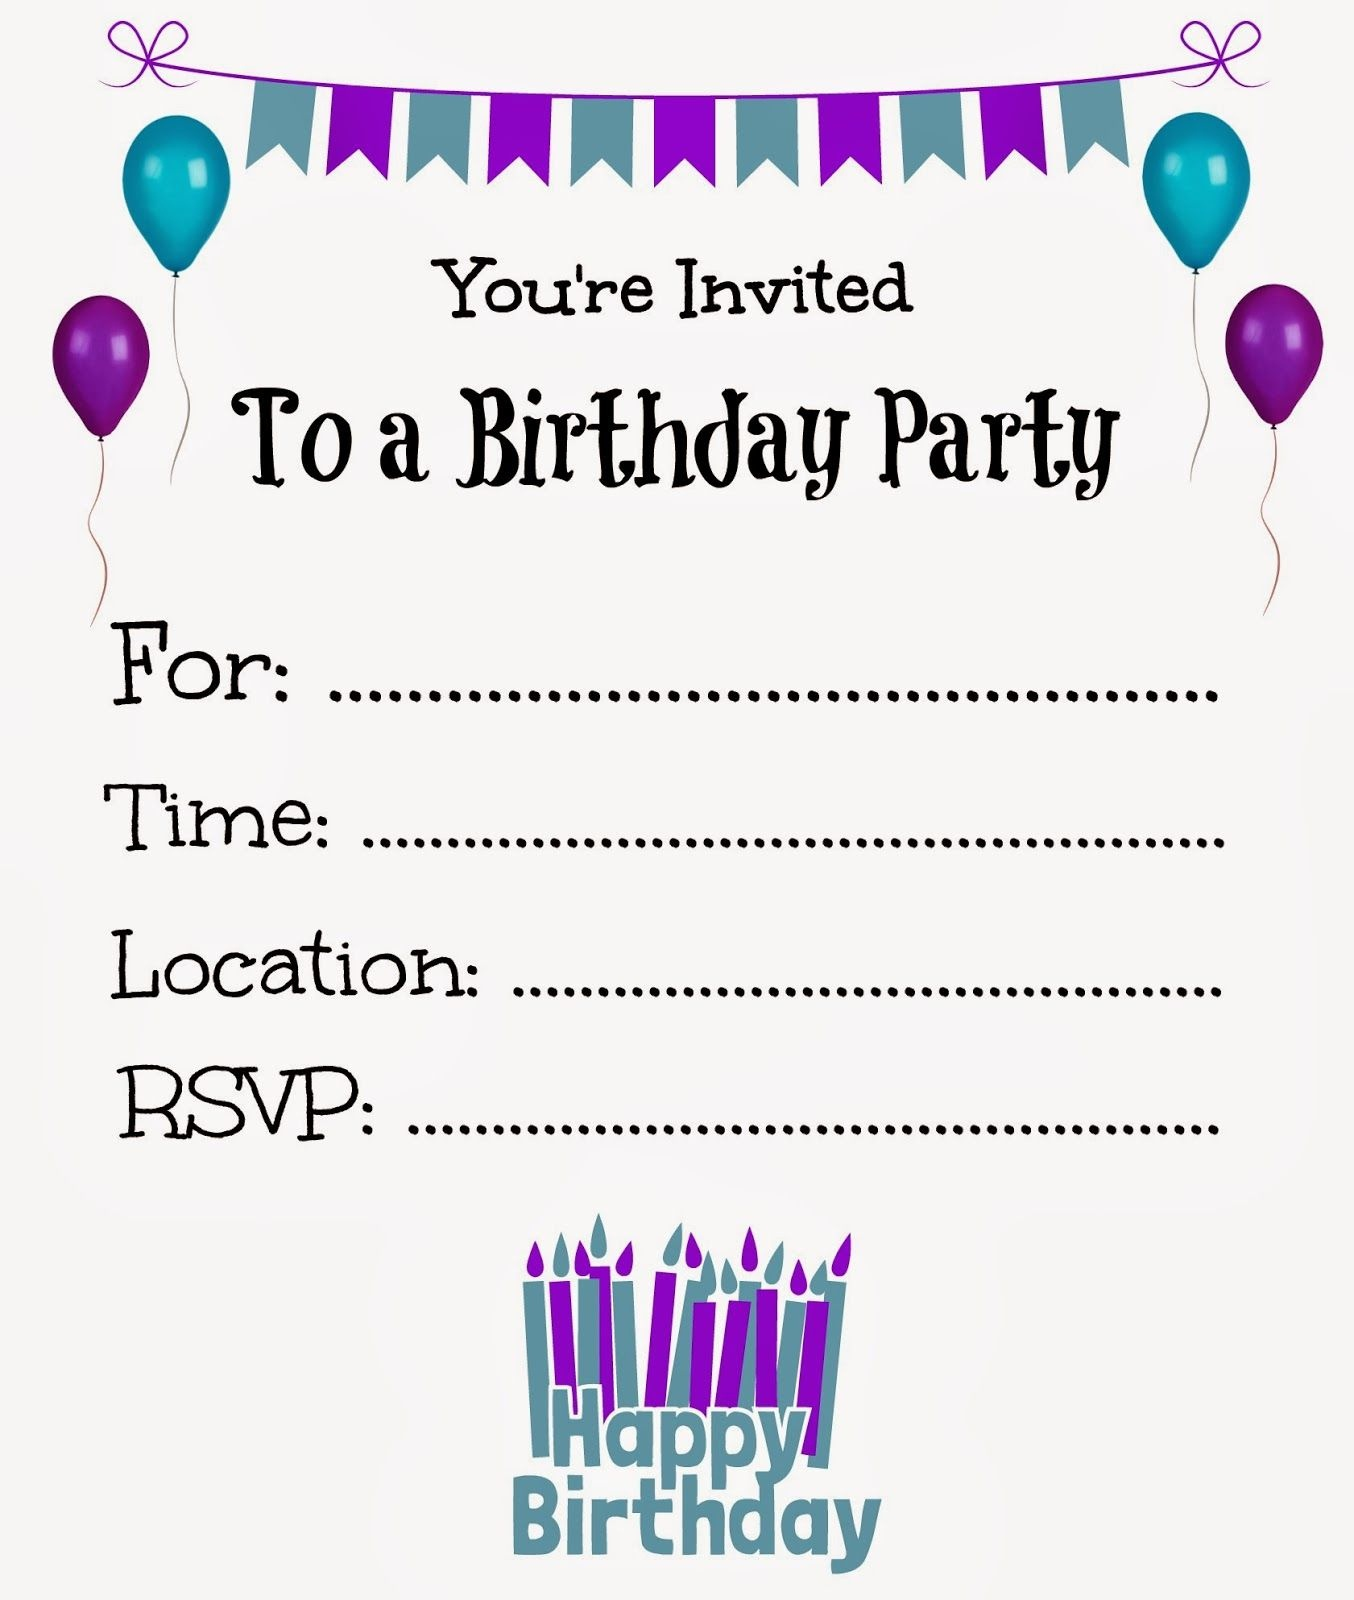 Free Printable Birthday Invitations For Kids #freeprintables - Free Printable Event Invitations